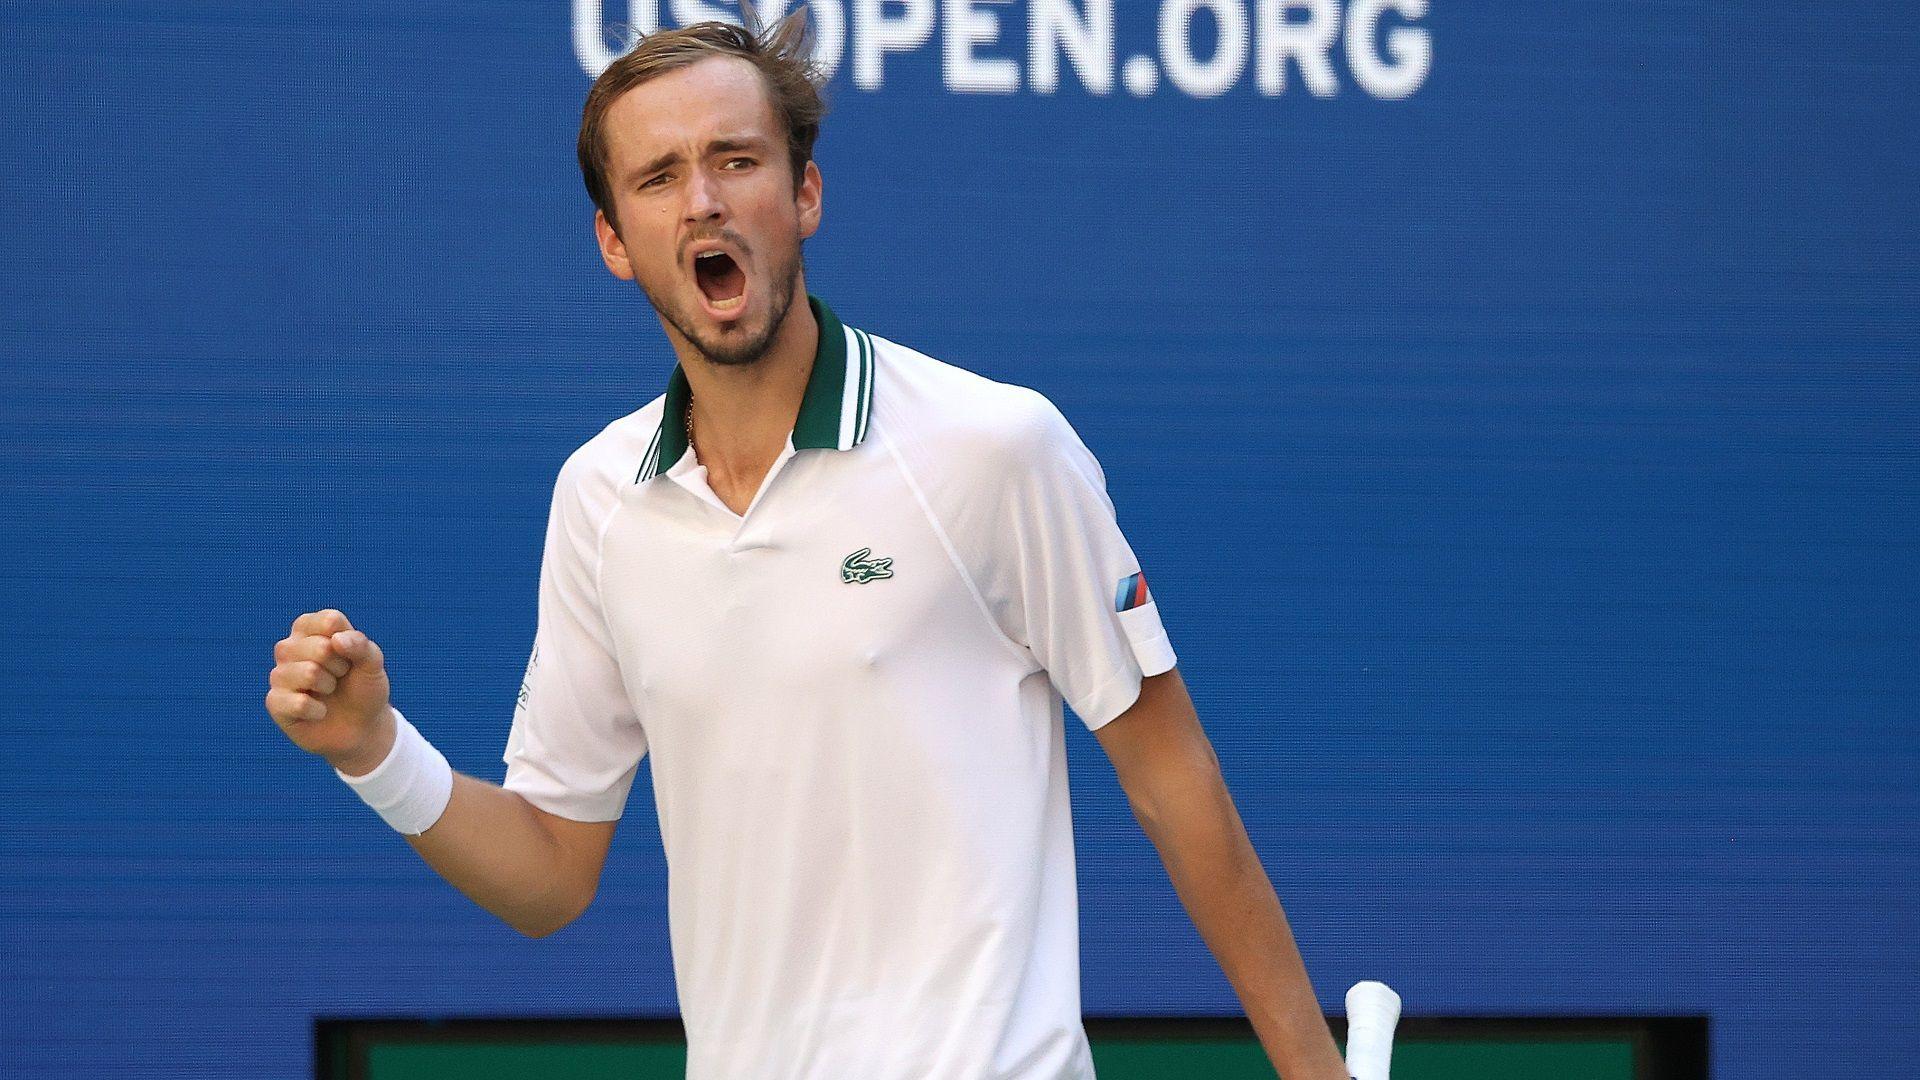 Медведев приключи приказката на квалификанта Ван де Зандшулп и е на полуфинал